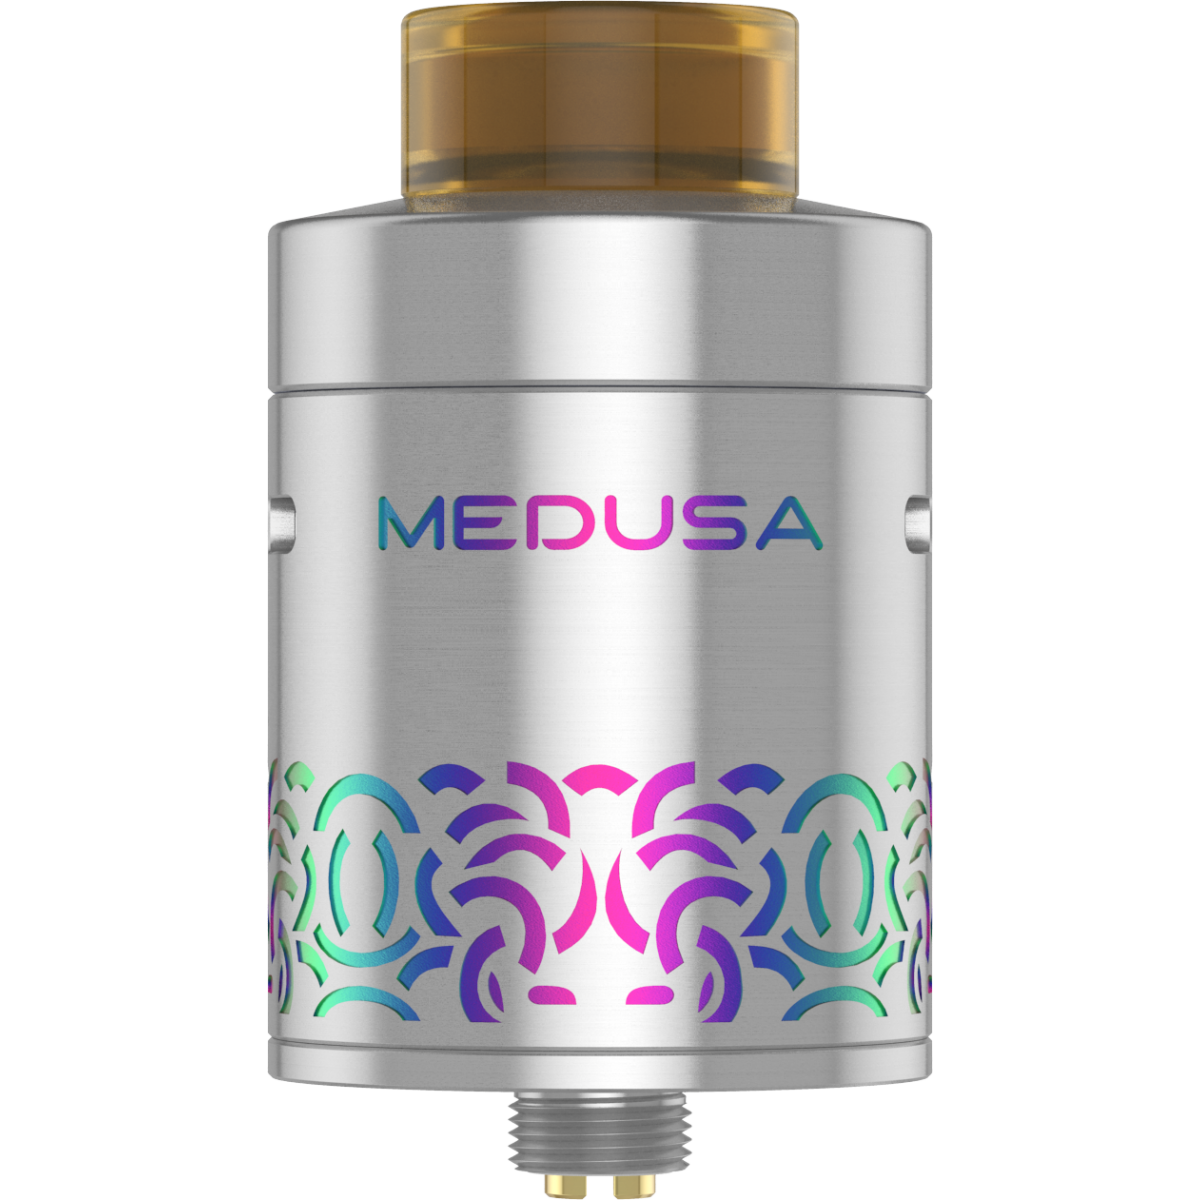 Medusa Reborn RDTA